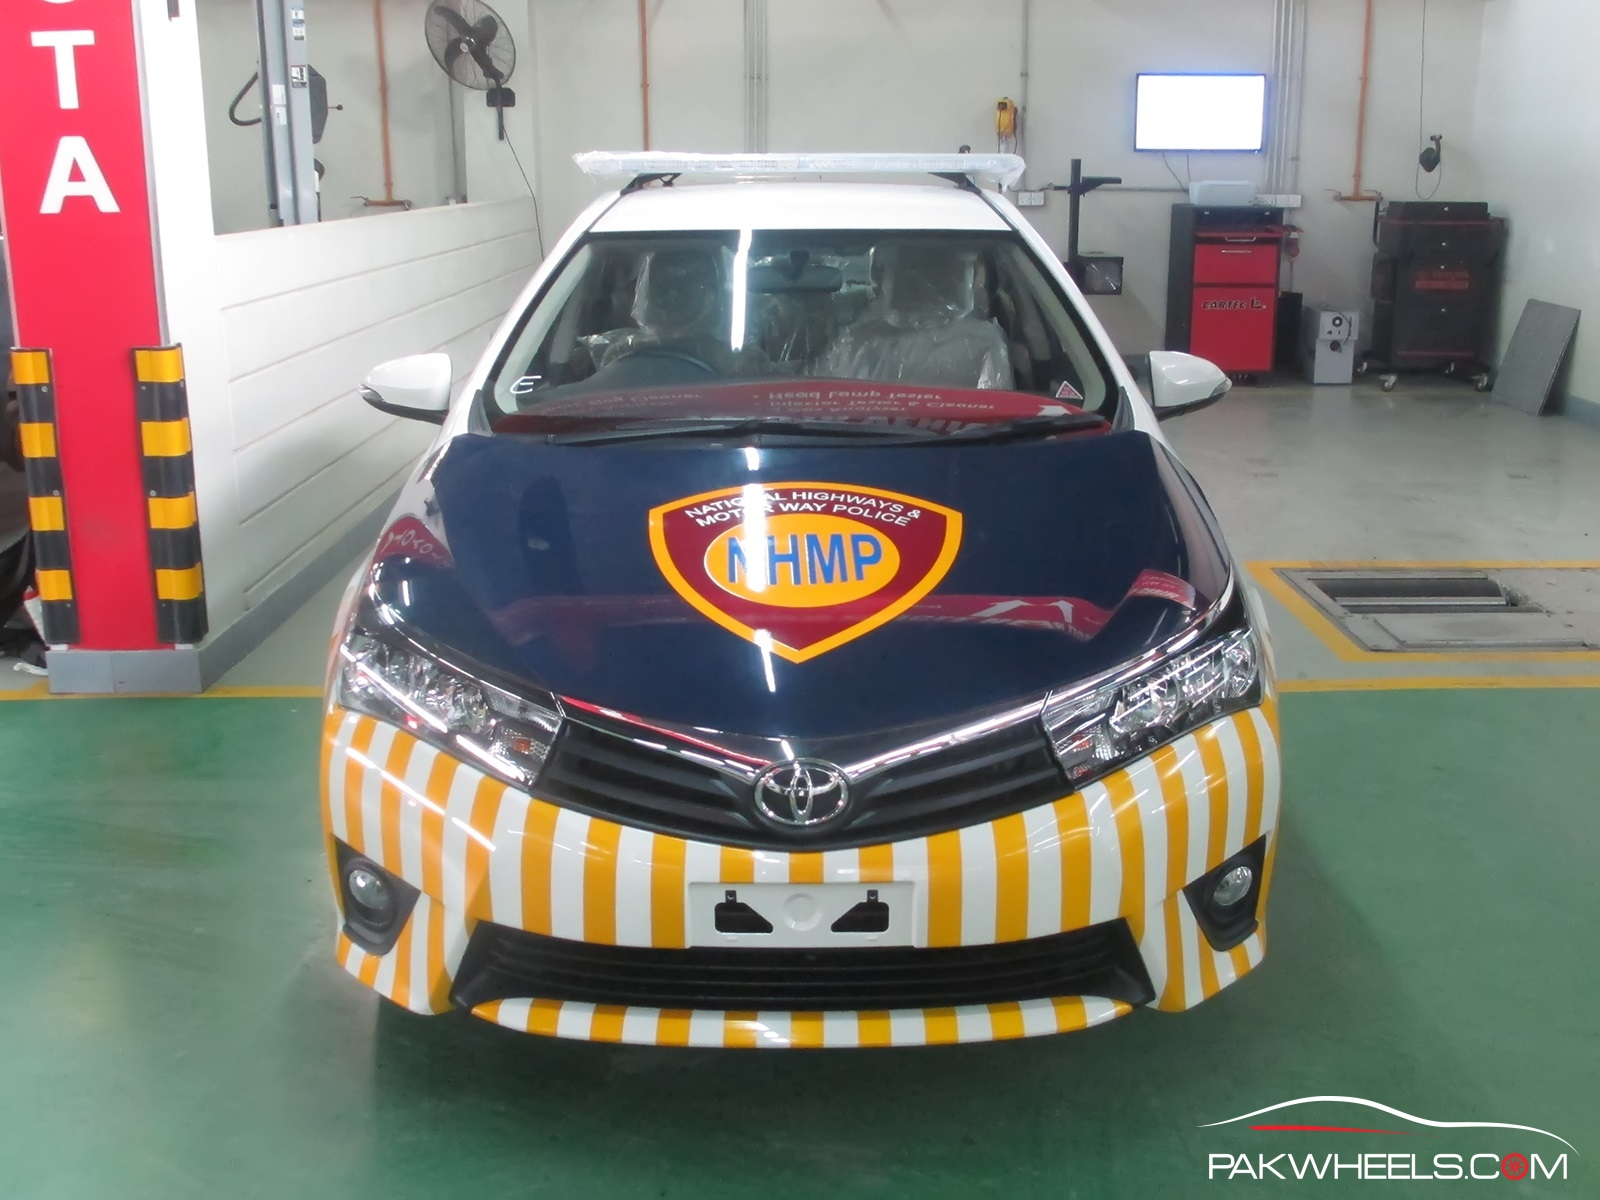 Motorway-police-toyota-corolla-altis-1-11